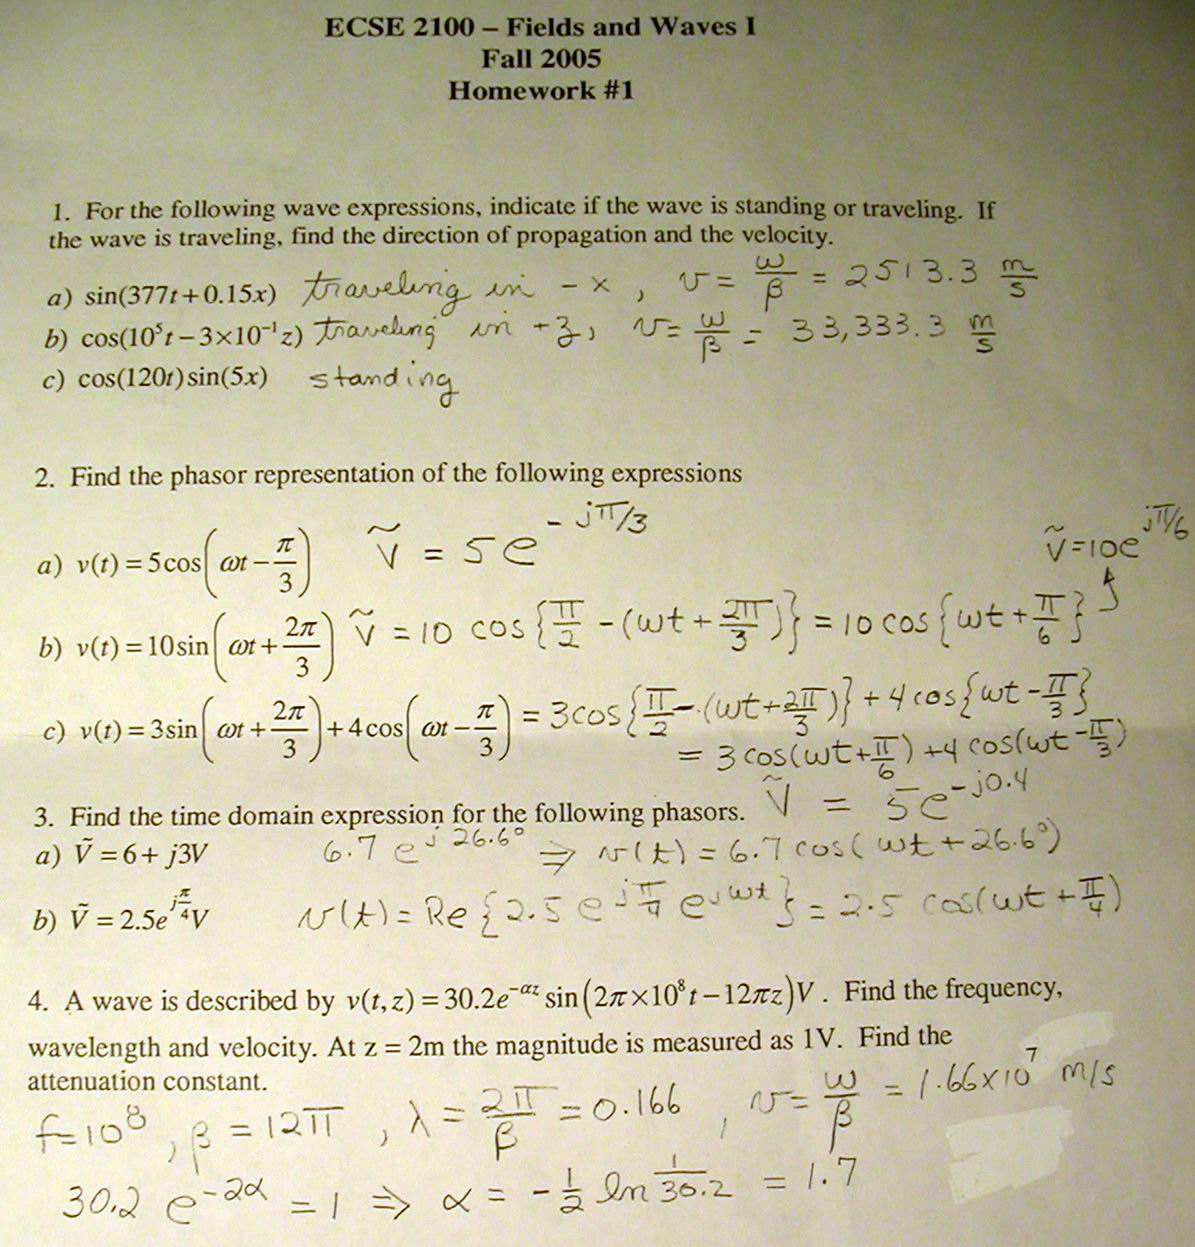 Hw1 10 Solutions